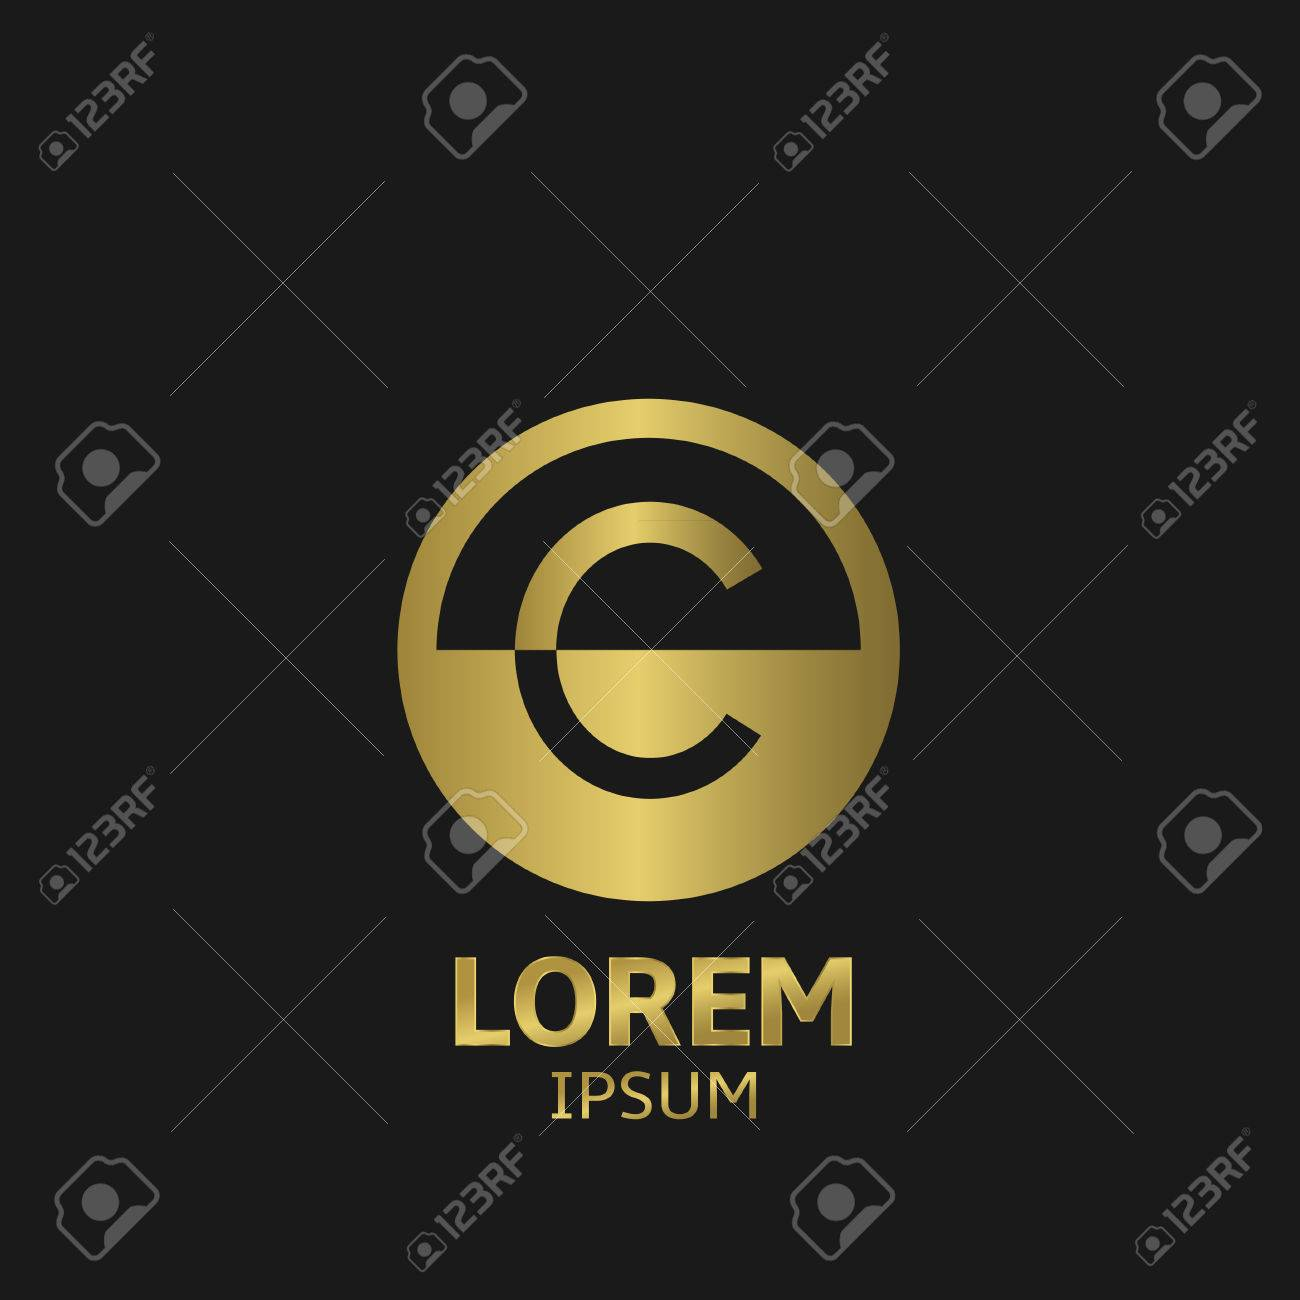 golden letter c logo template vector illustration royalty free